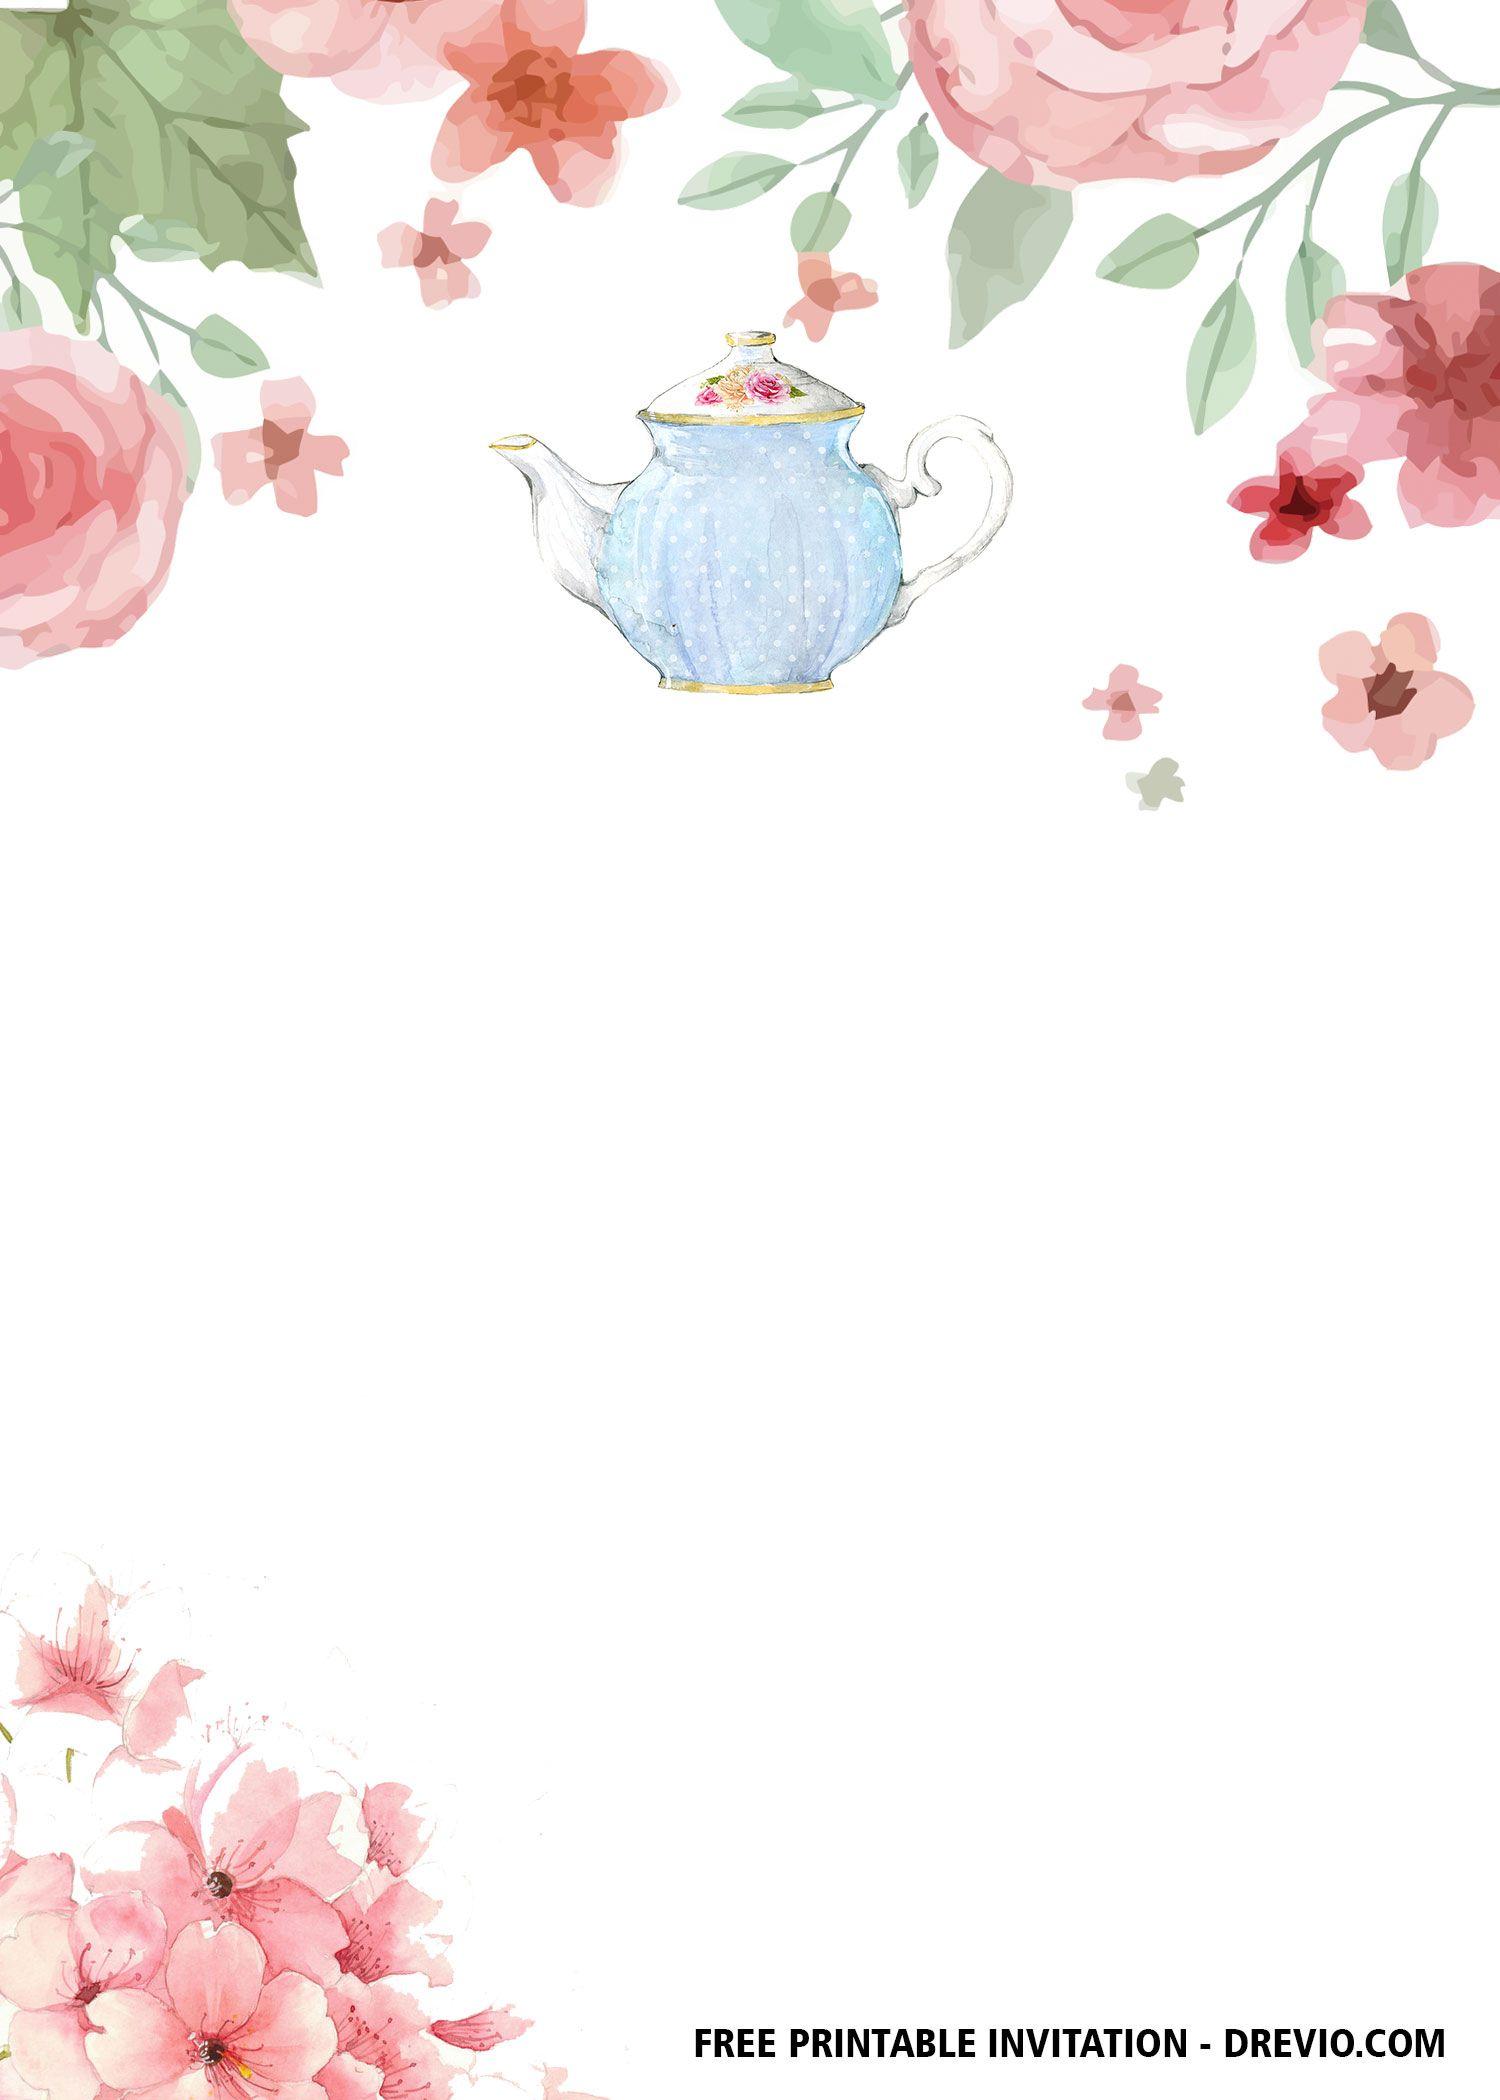 Free Floral Tea Party Invitation Templates Tea Party Invitations Party Invite Template Tea Party